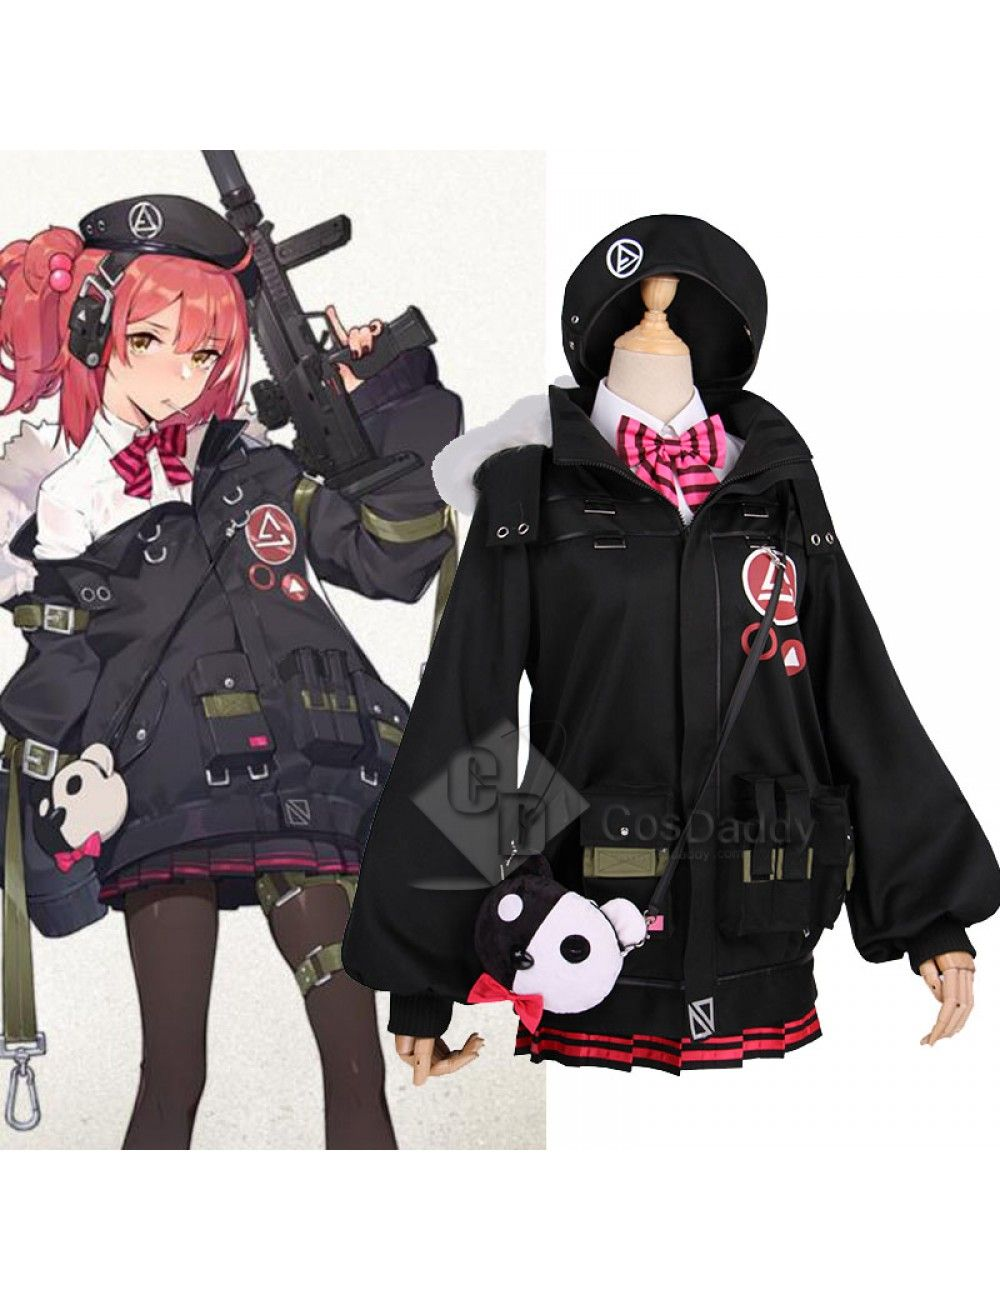 Girls Frontline mp9 Cosplay Costume  Girls frontline, Cosplay